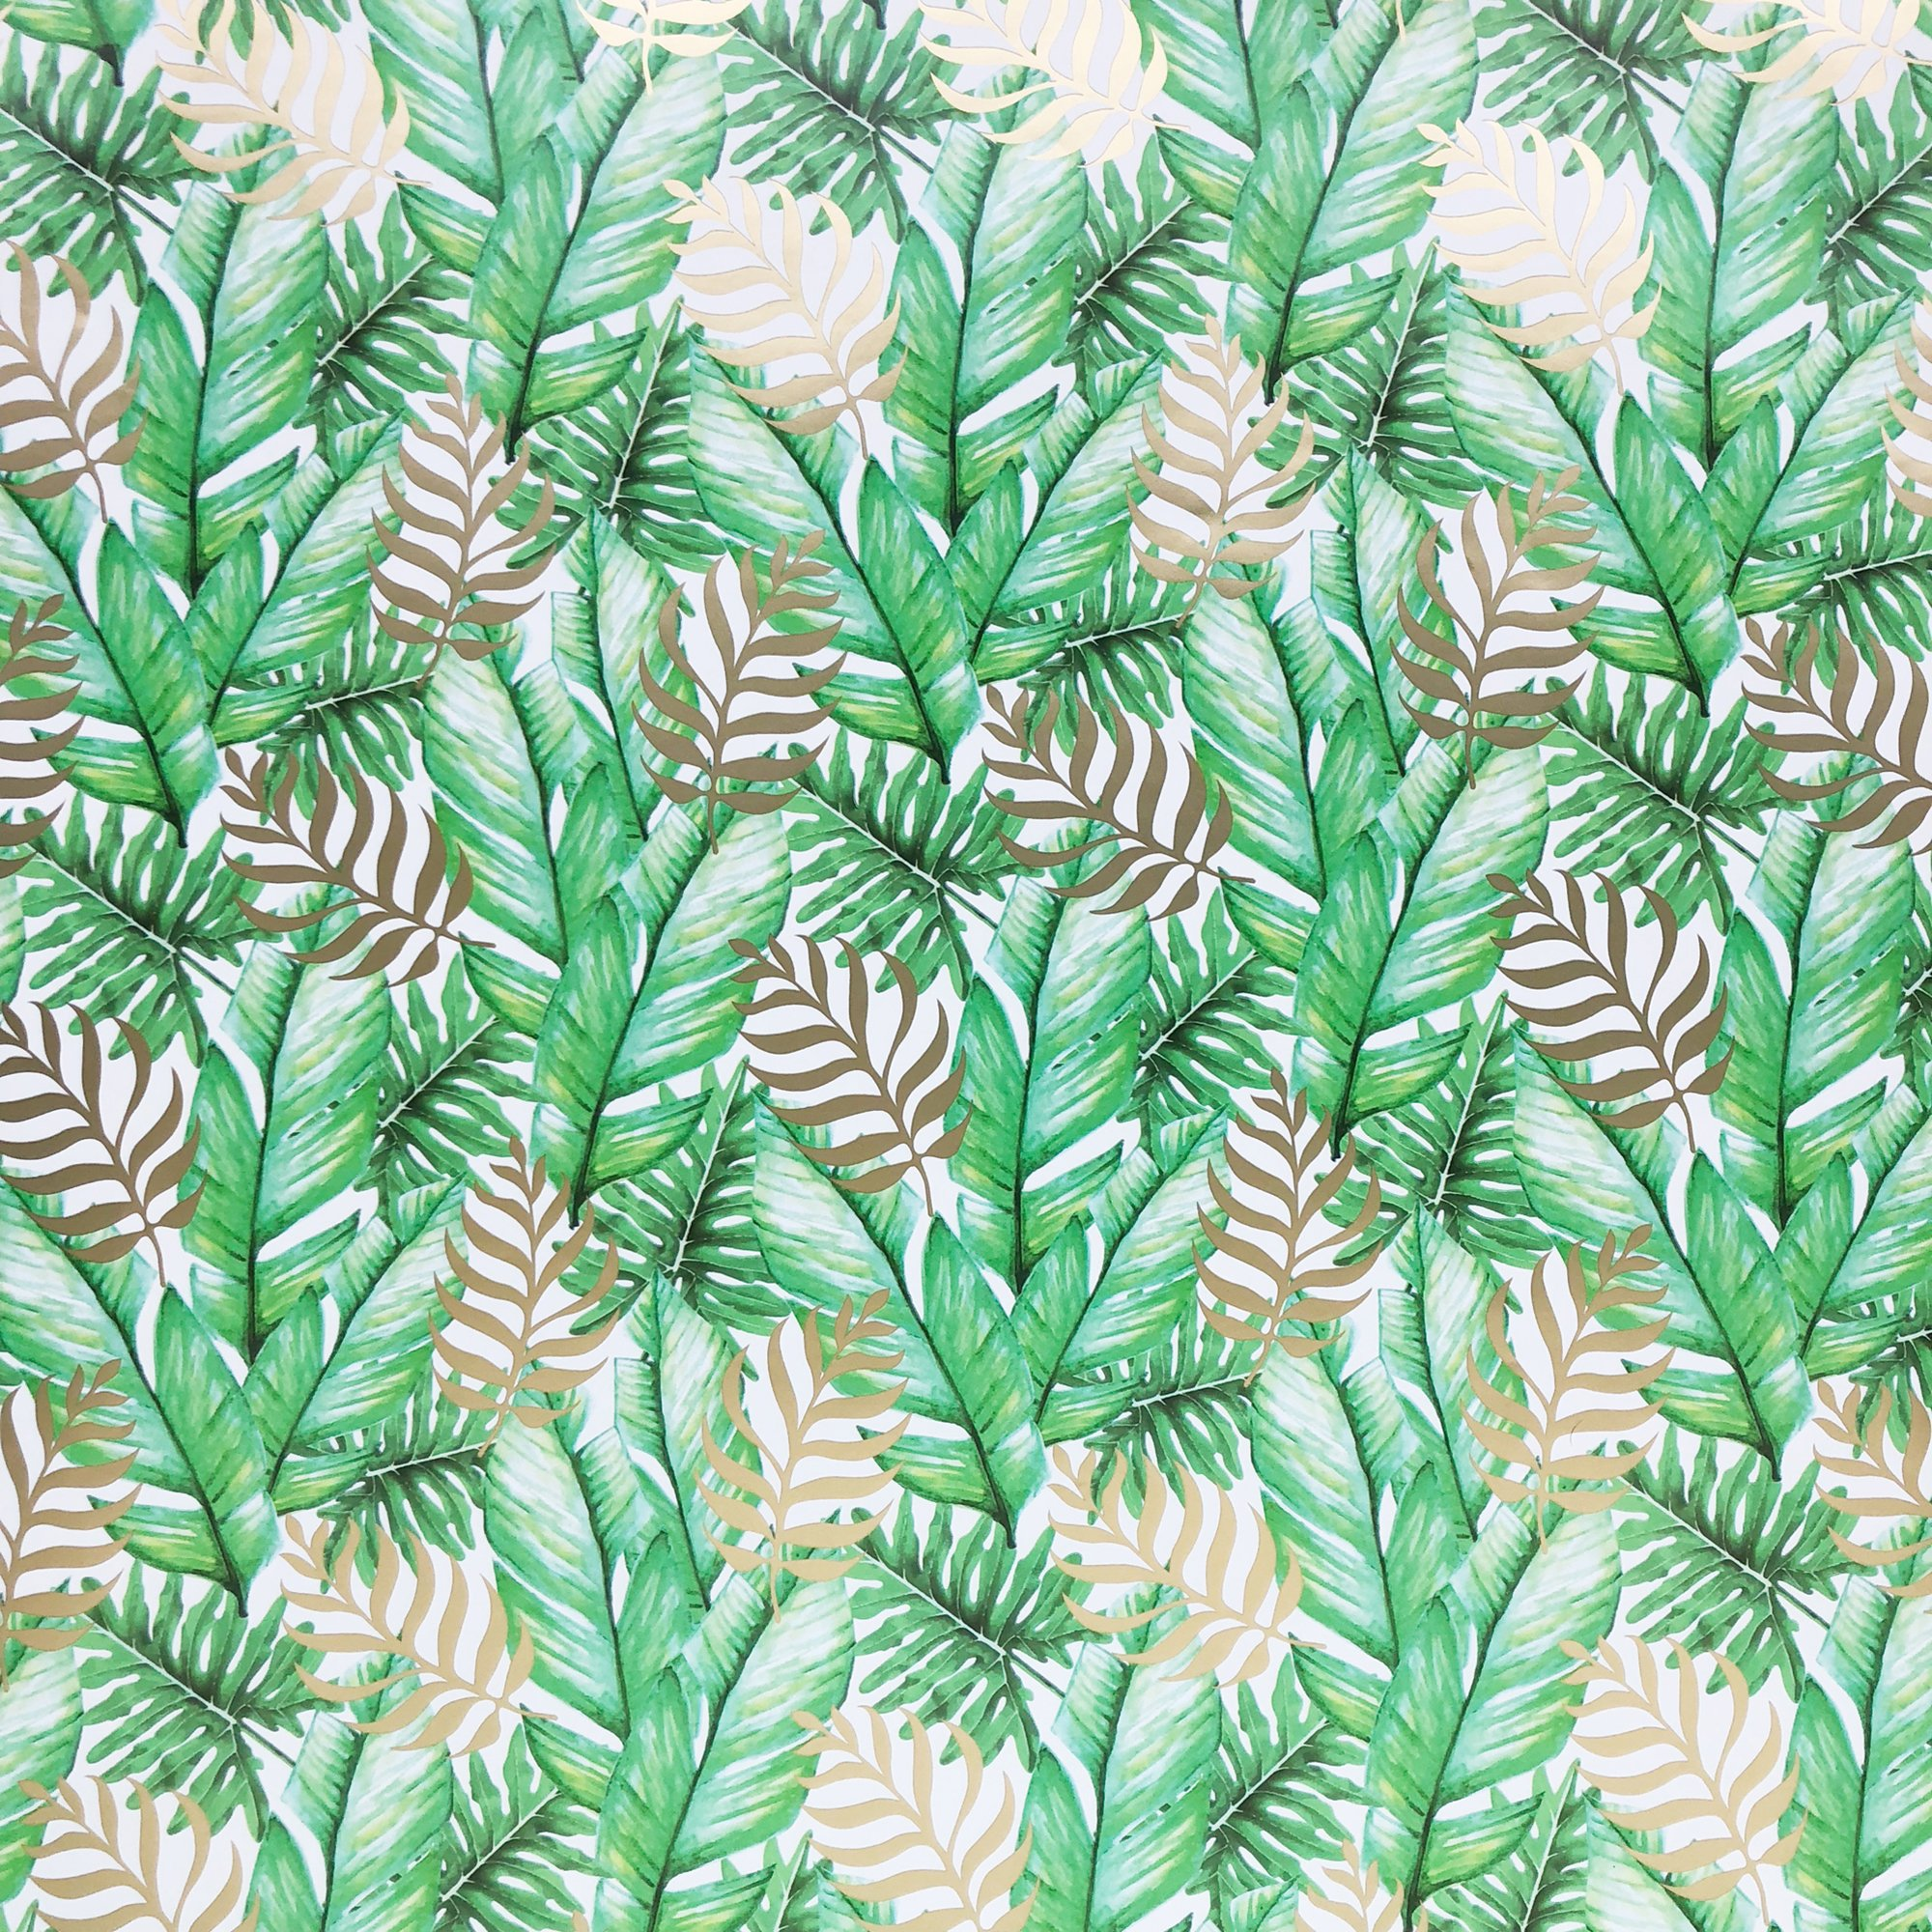 Jillson & Roberts Gift Wrap, Tropic Thunder (8 Rolls 5ft x 30in)